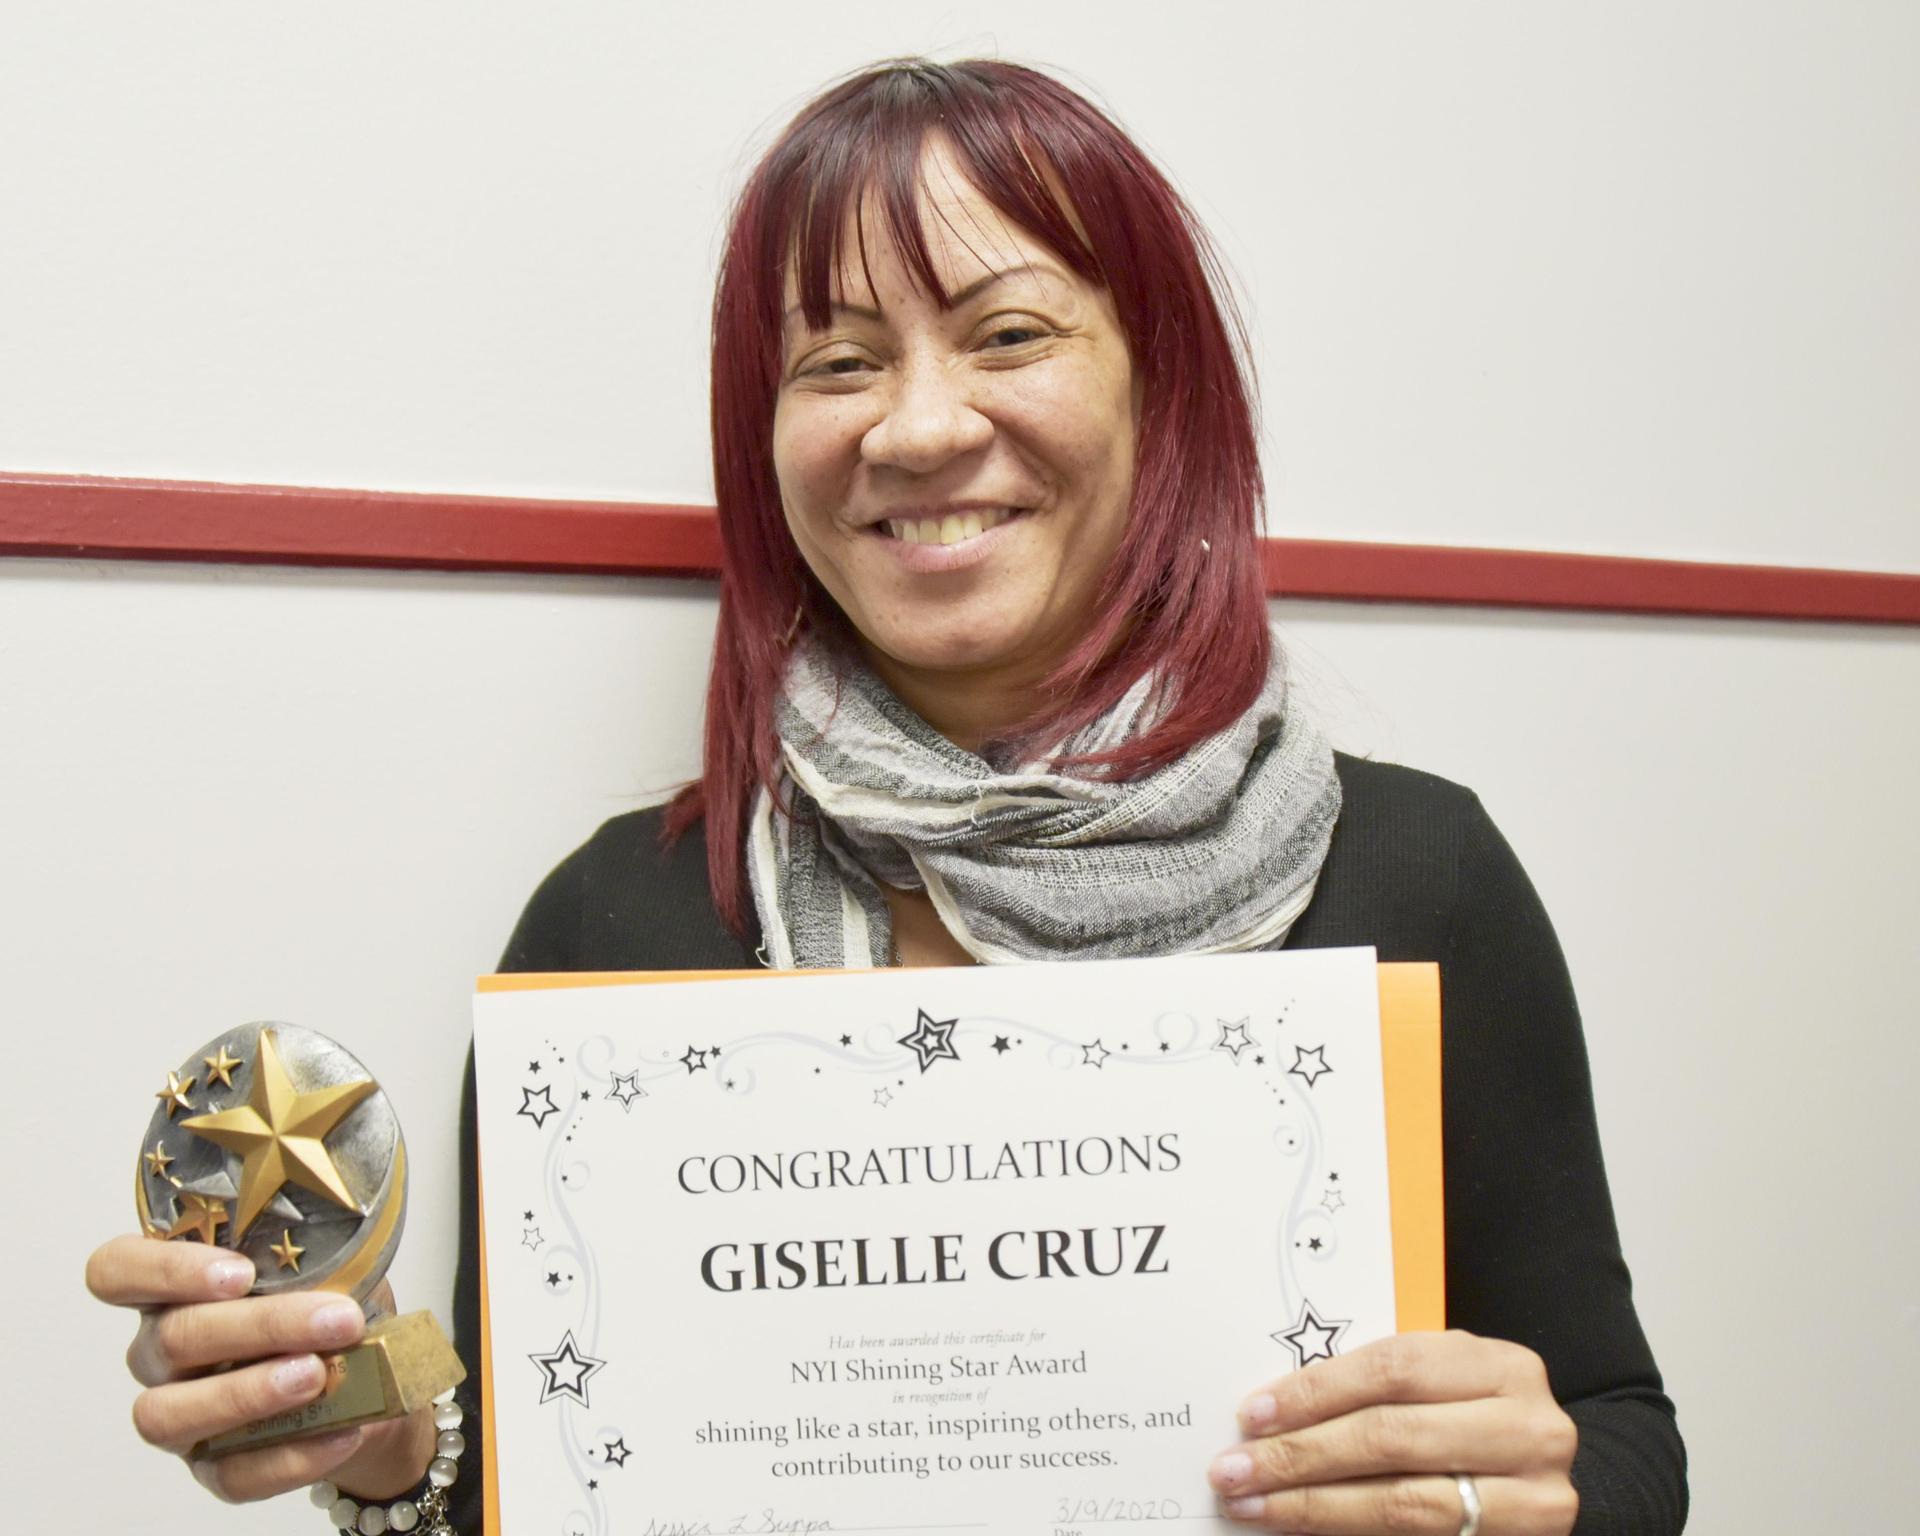 Giselle Cruz